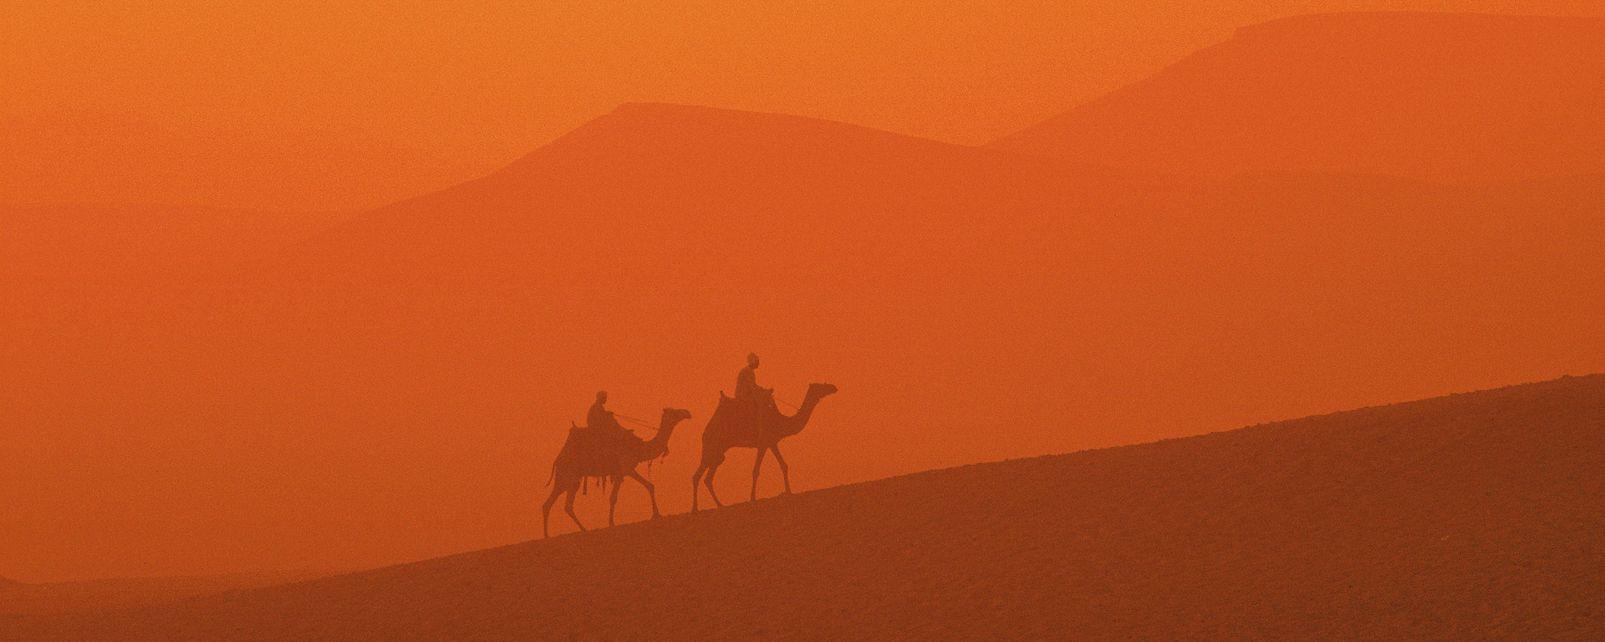 I dromedari, La fauna del deserto, La fauna e la flora, Egitto